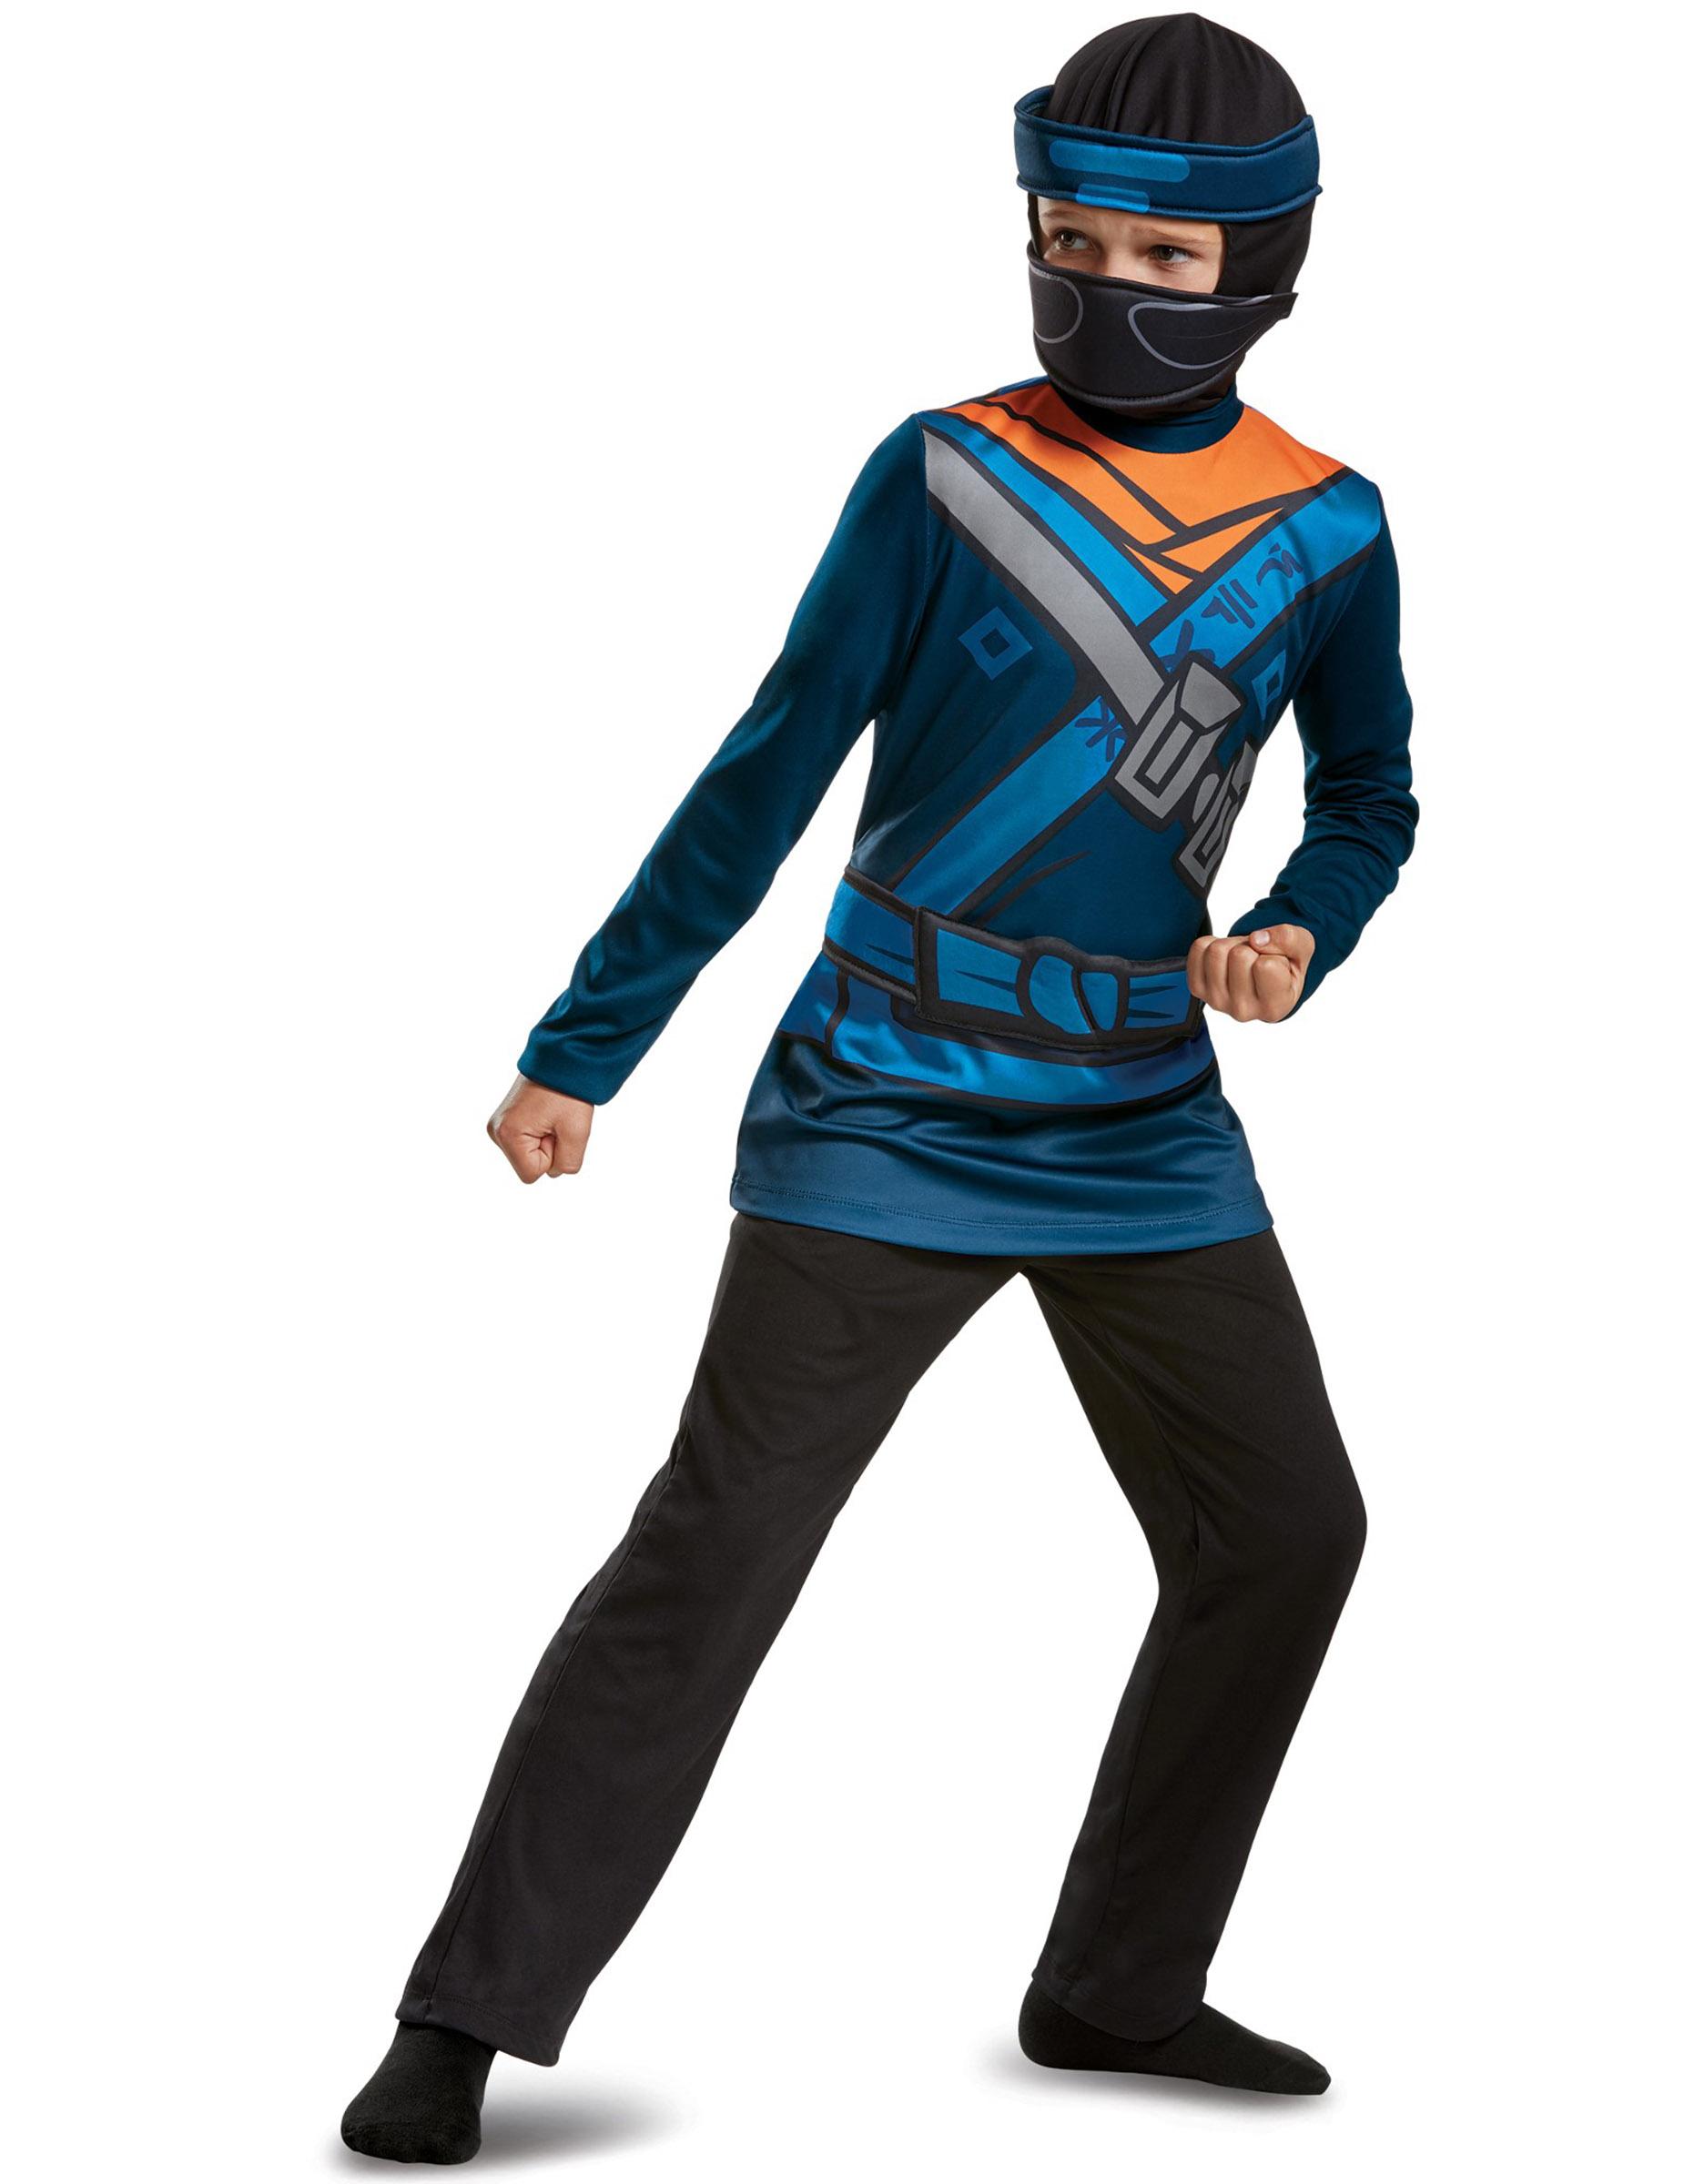 Verbazingwekkend Stoere ninja kostuums voor jongens - Vegaoo.nl IM-12